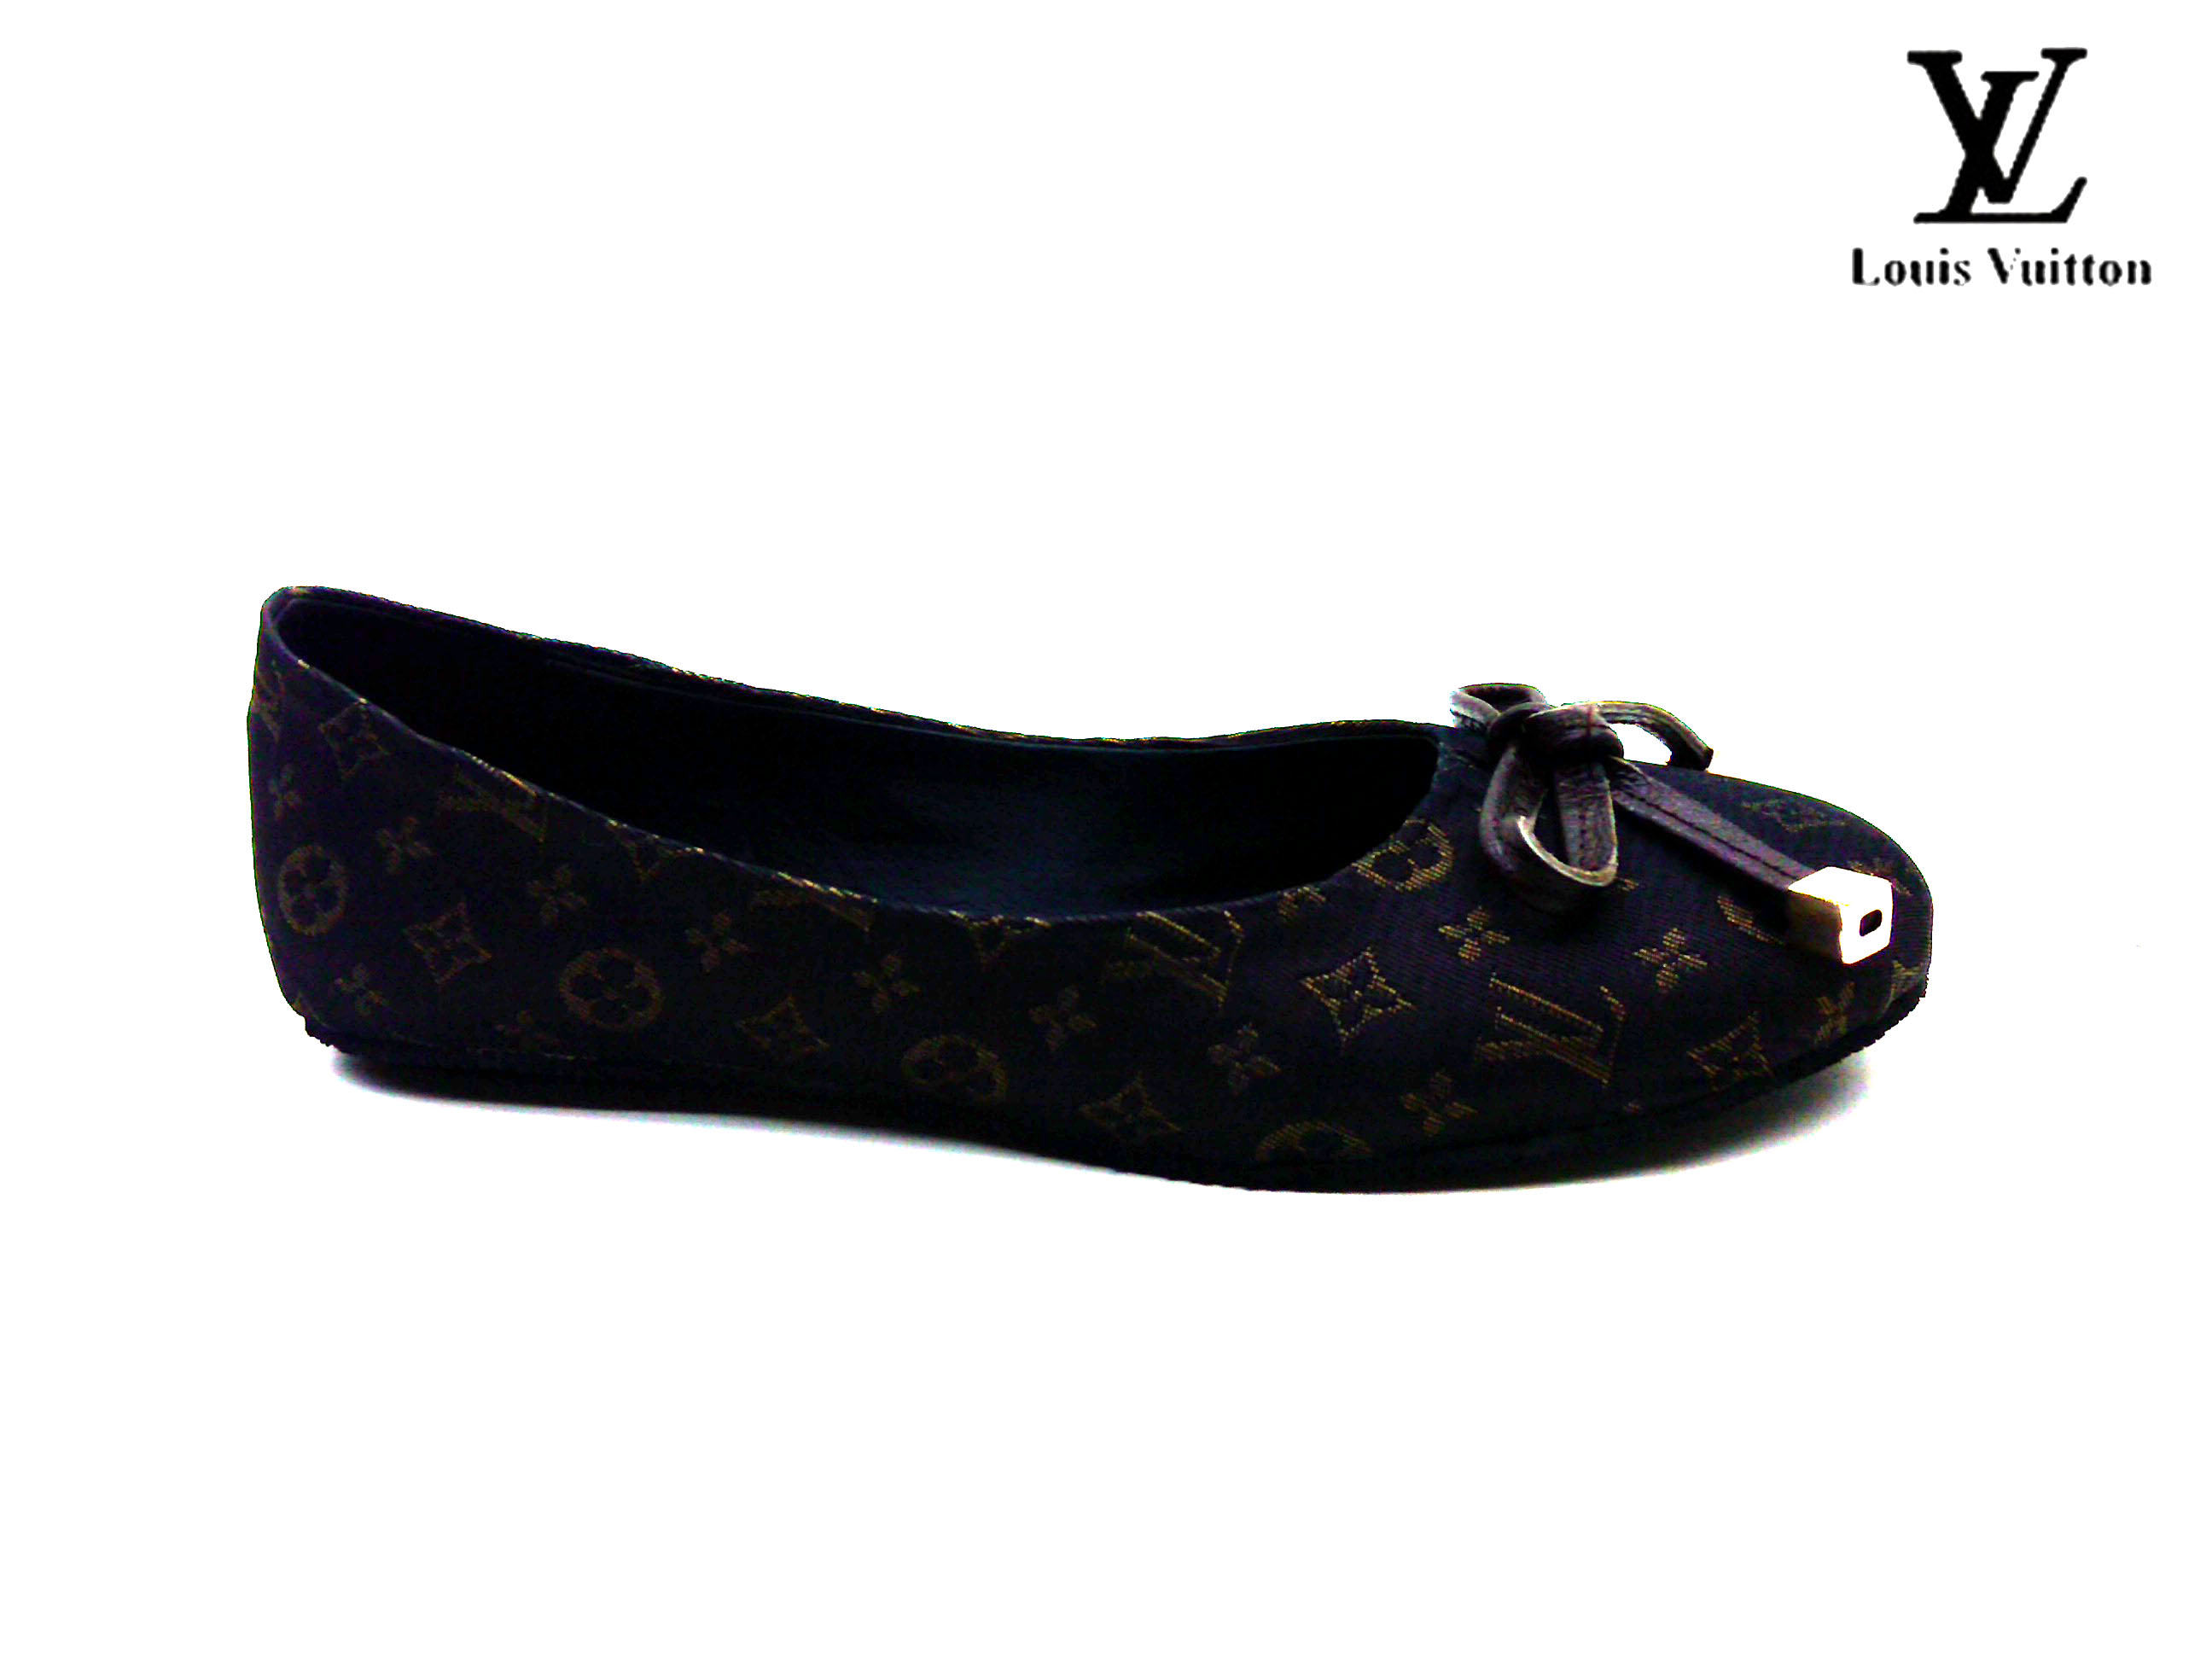 Louis Vuitton Women Shoes Shoes-6